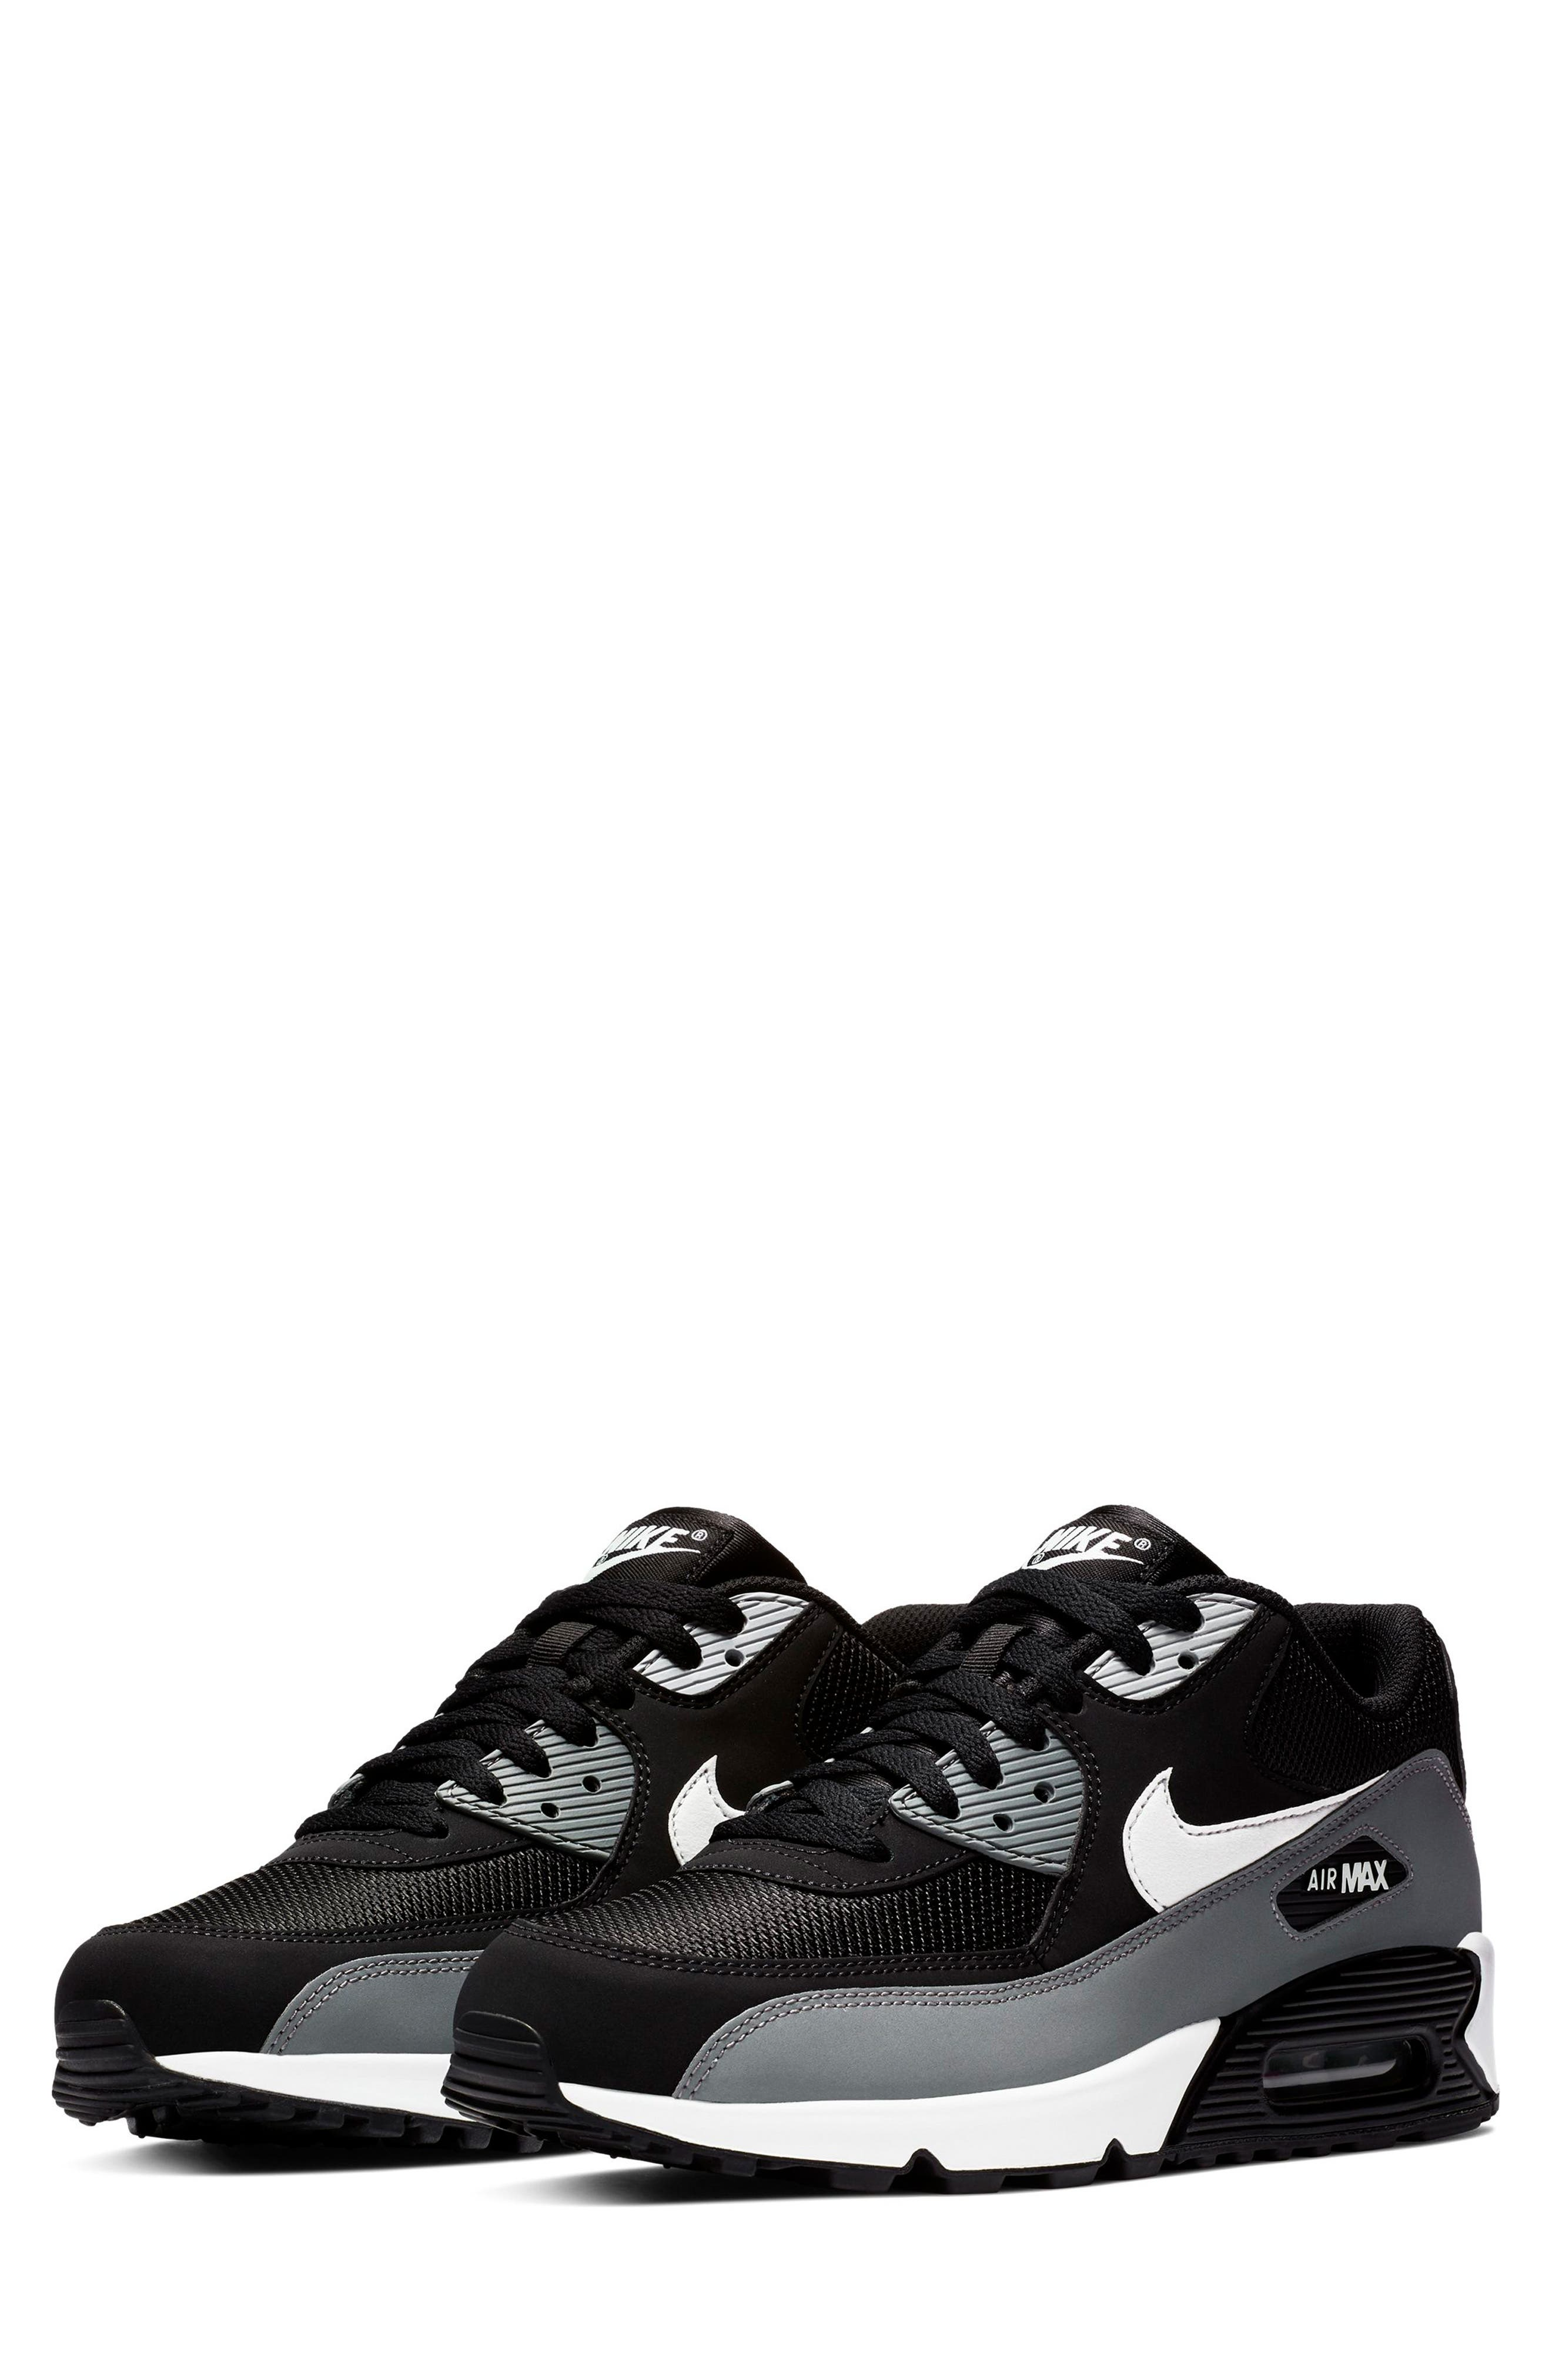 NIKE, Air Max 90 Essential Sneaker, Main thumbnail 1, color, BLACK/ WHITE/ COOL GREY